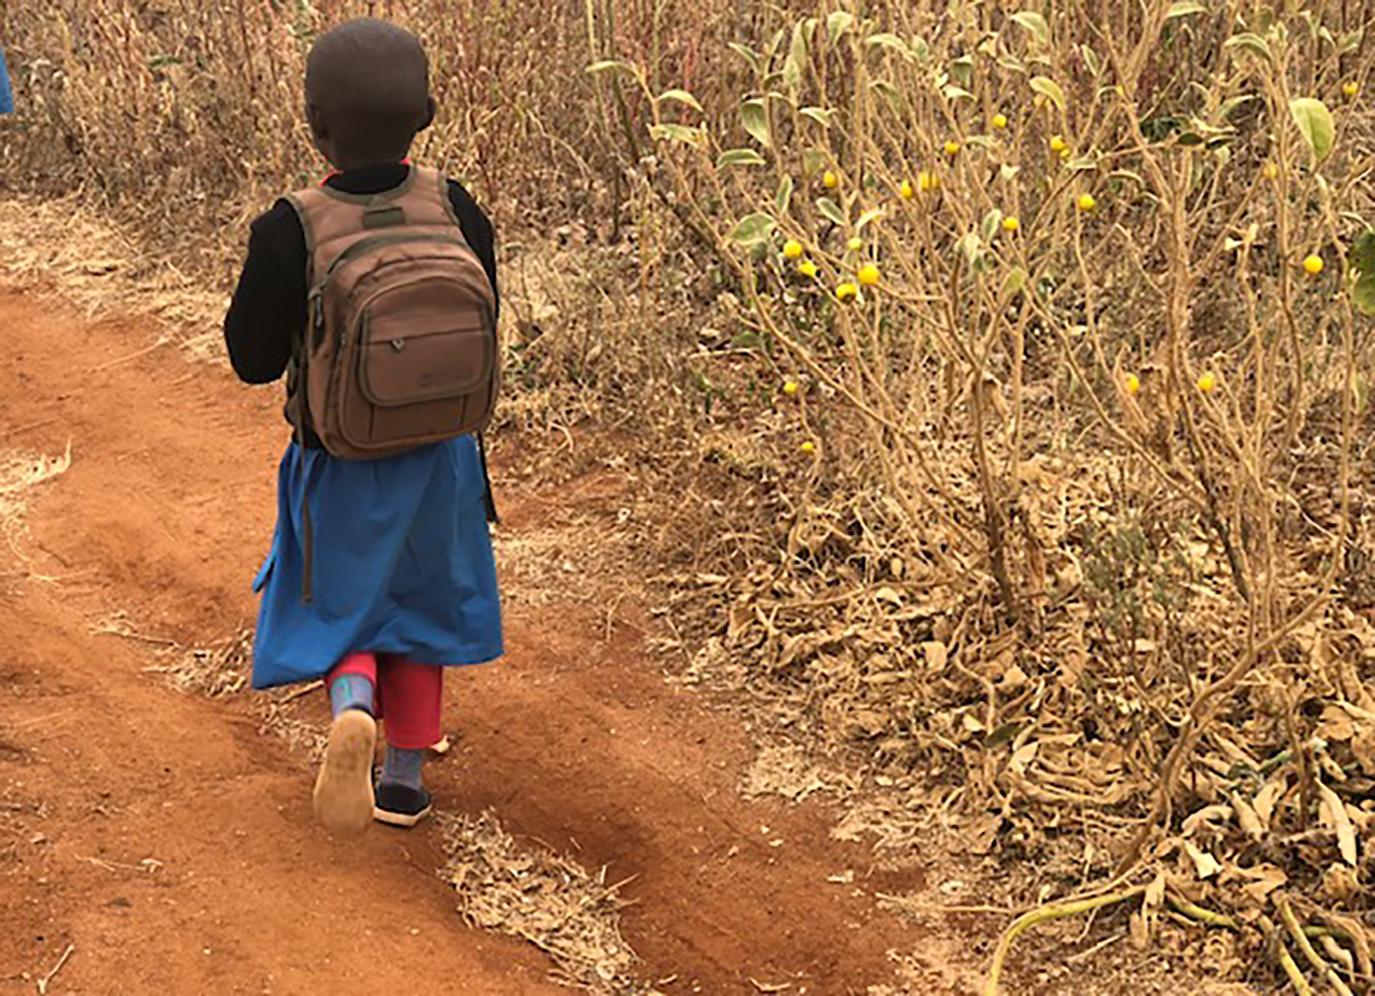 Child walking home from school in rural Kenya